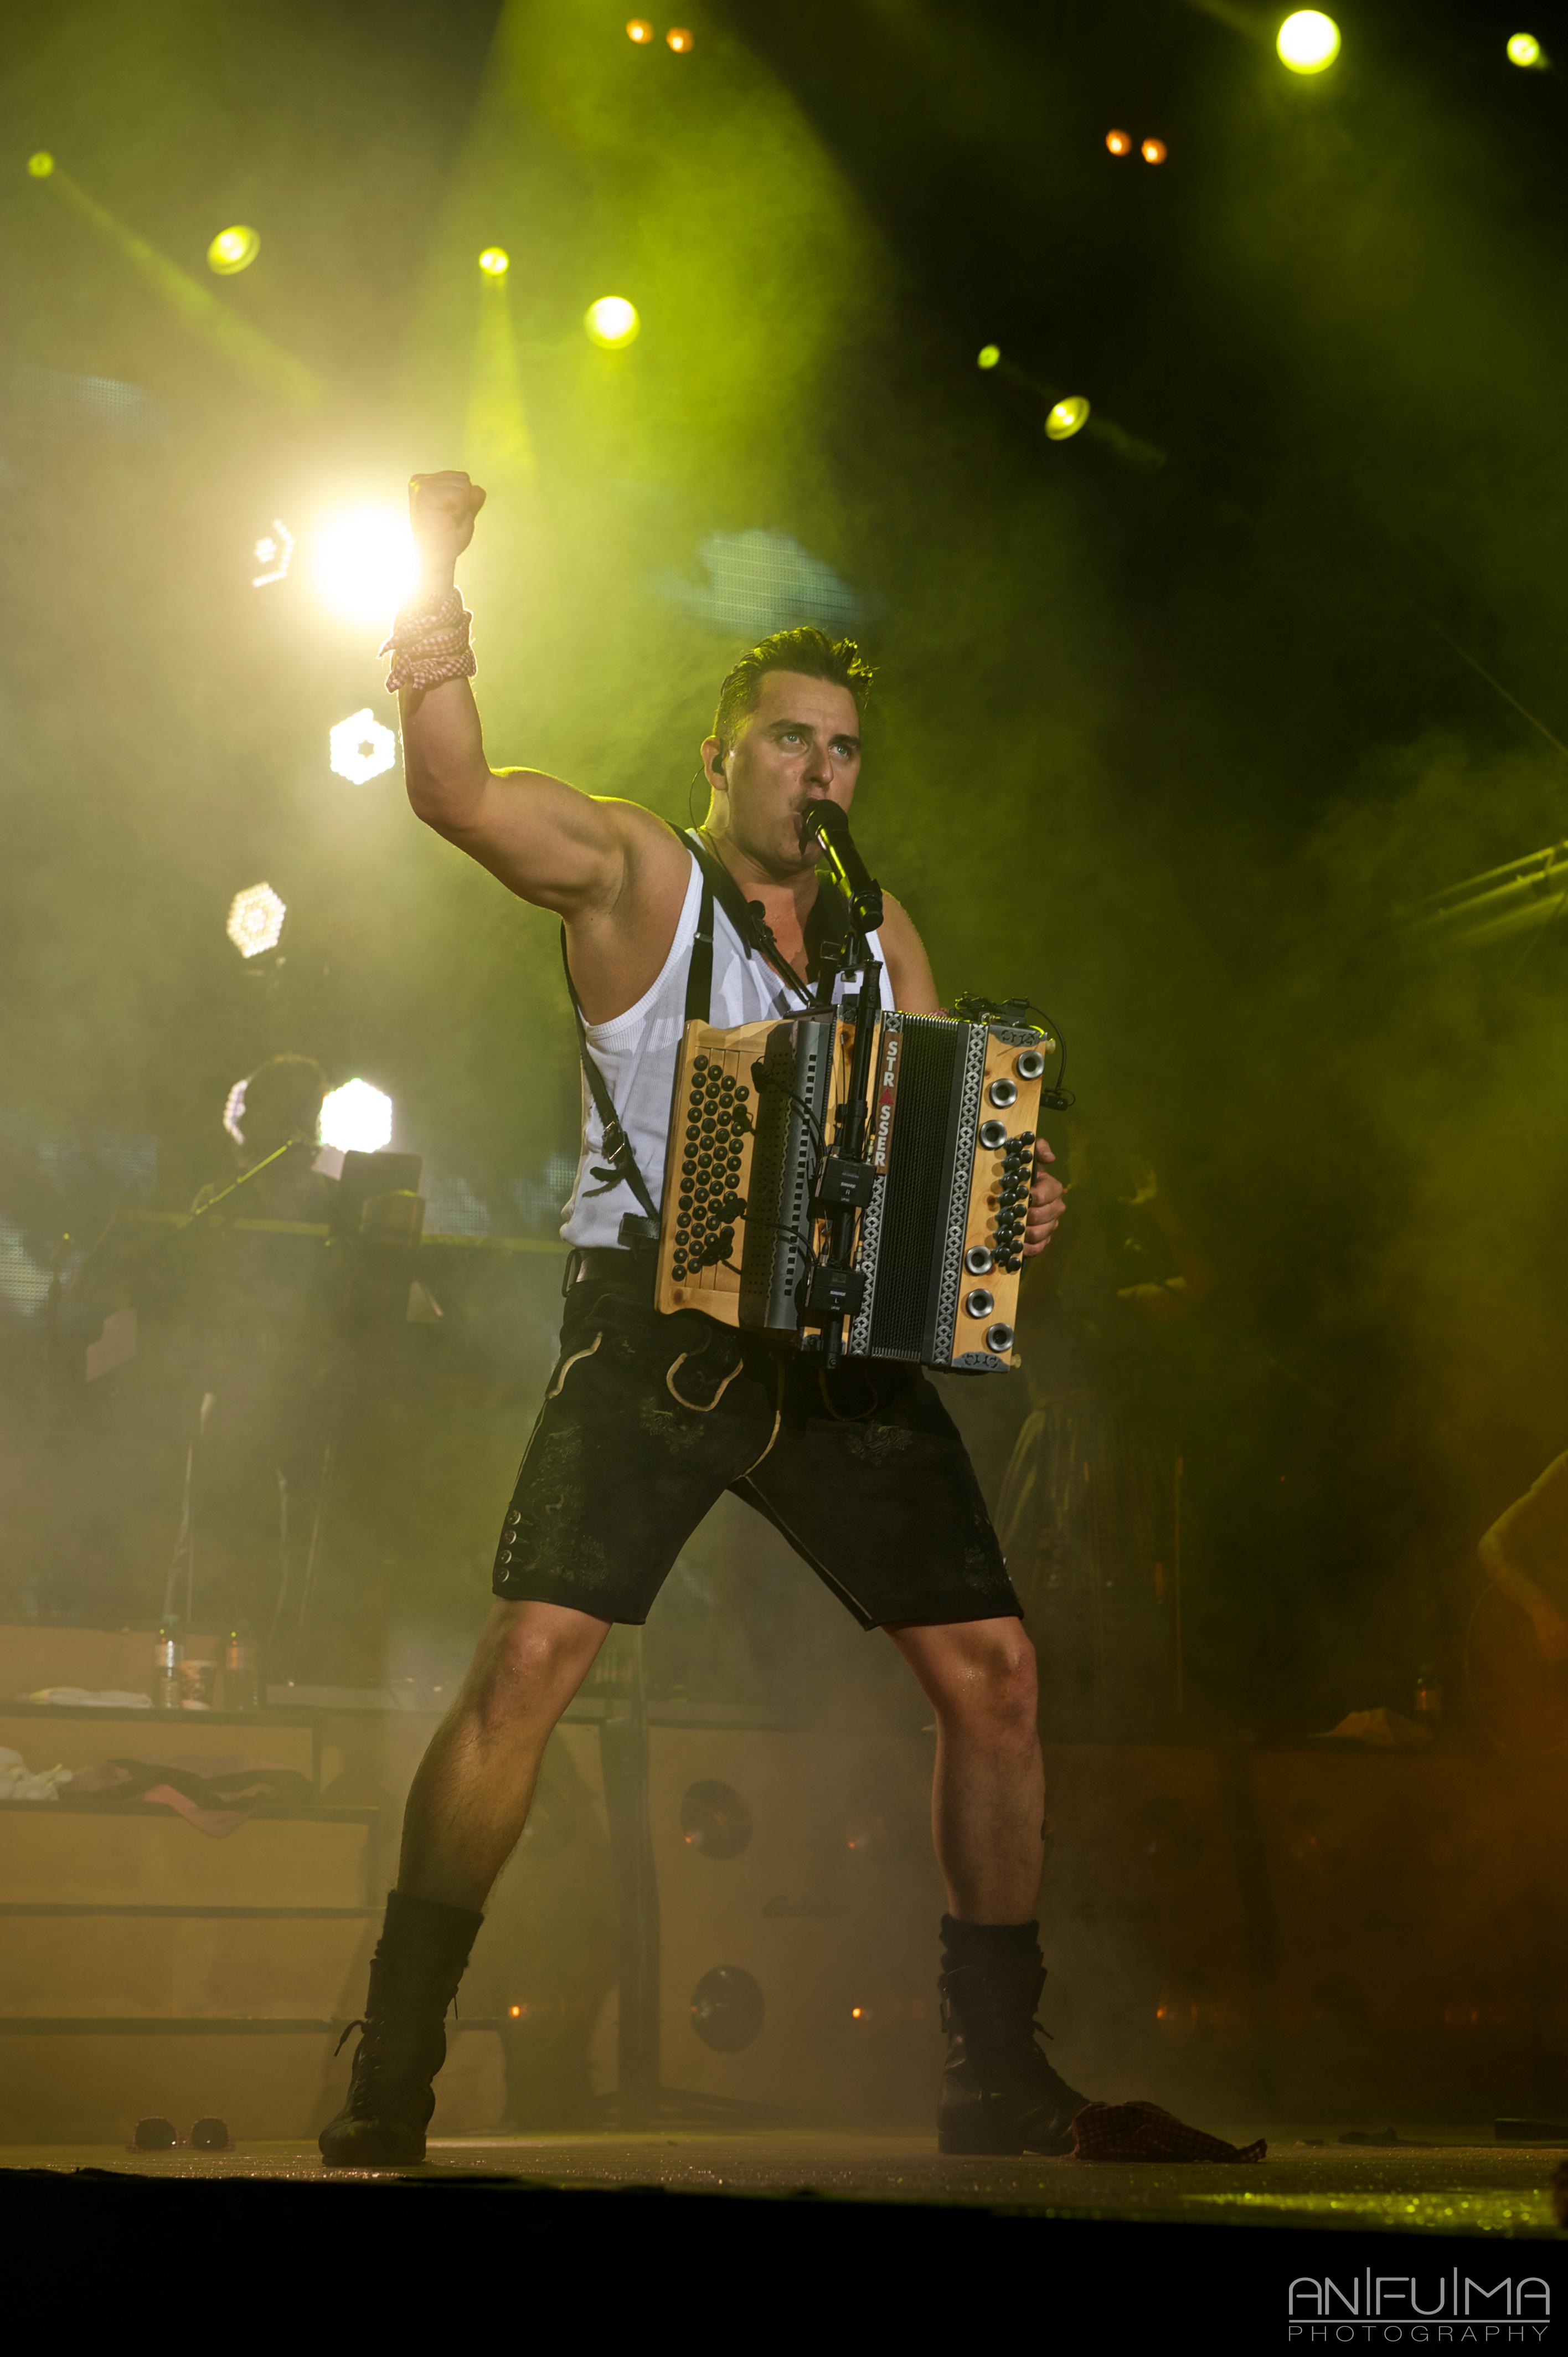 Andreas Gabalier, Musician